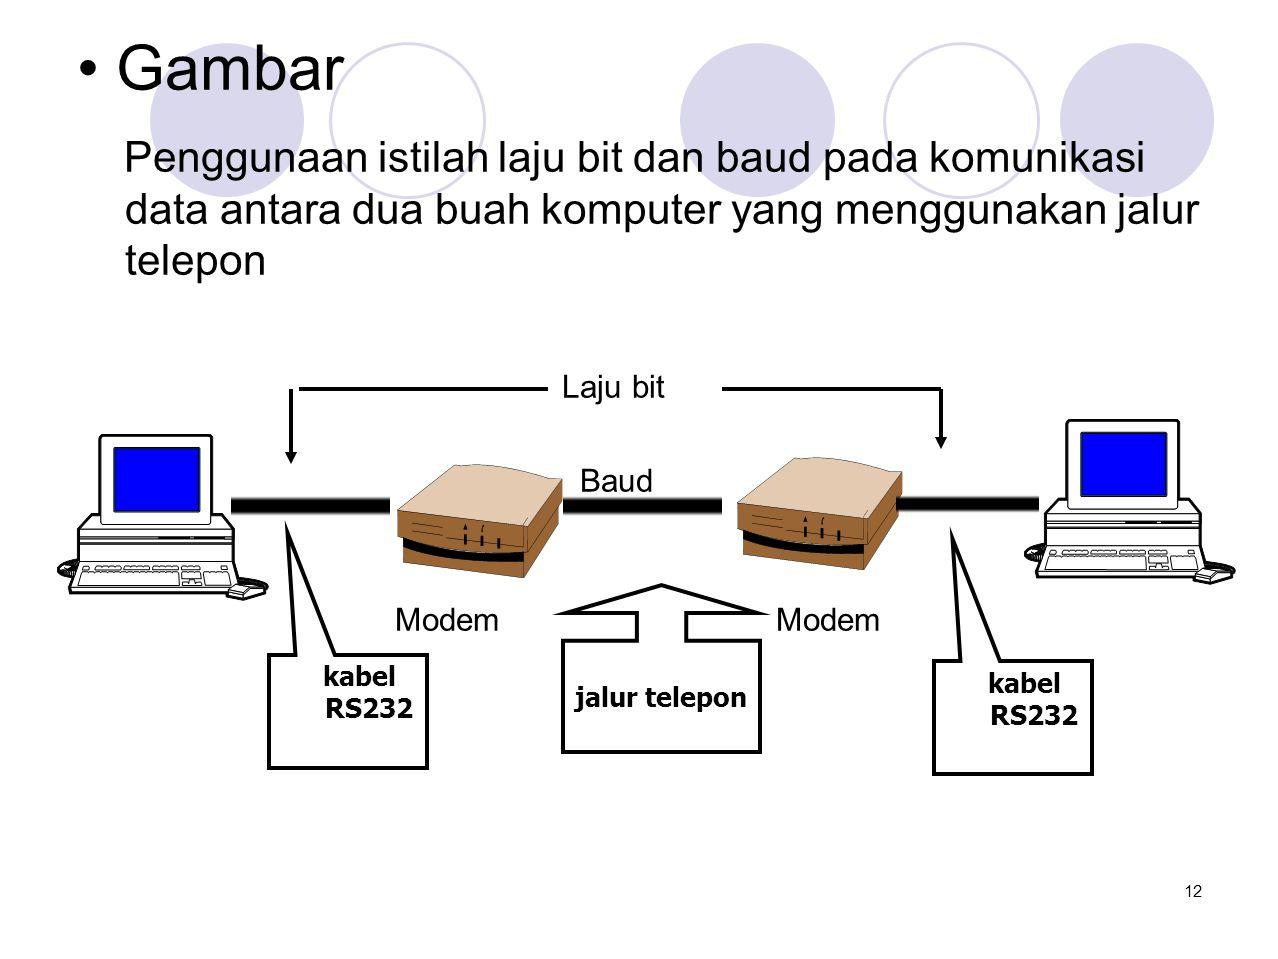 • Gambar Penggunaan istilah laju bit dan baud pada komunikasi data antara dua buah komputer yang menggunakan jalur telepon Laju bit Baud Modem Modem k